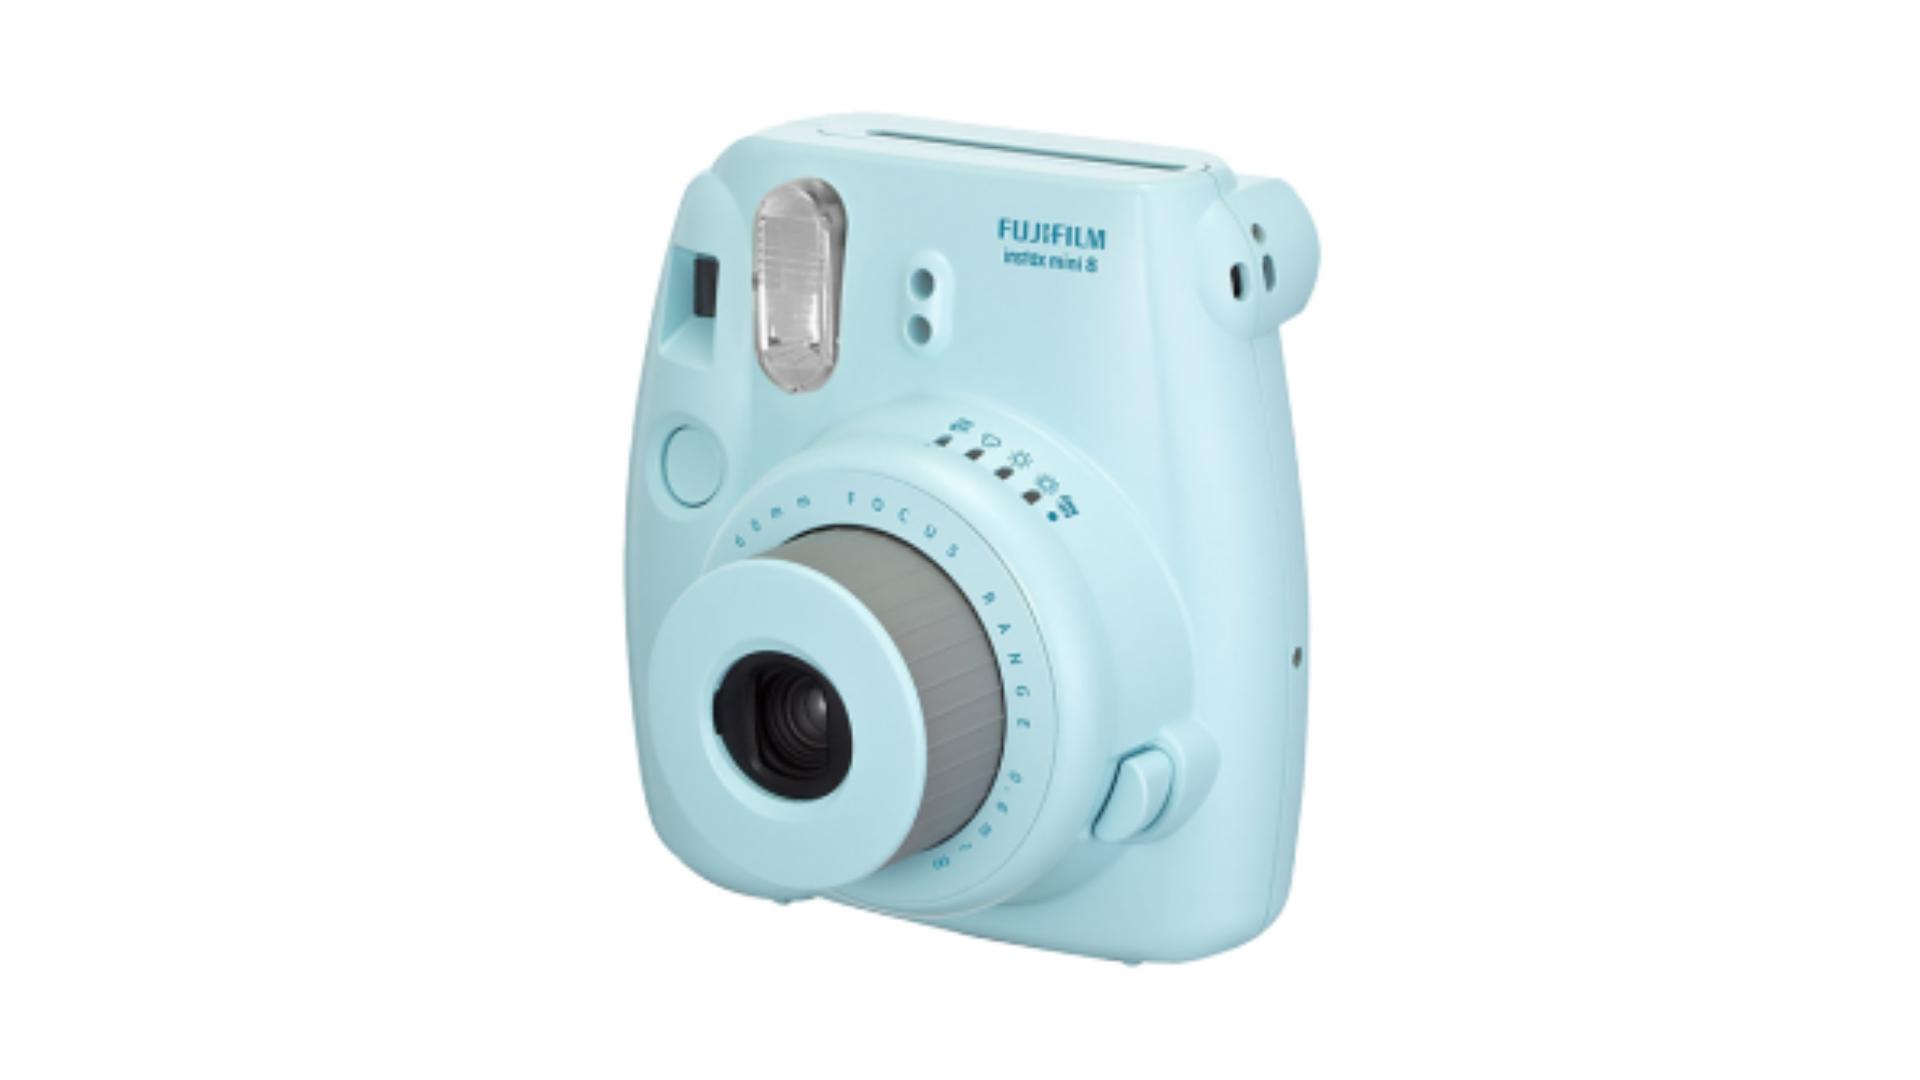 Fujifilm Instax Mini 8 prices